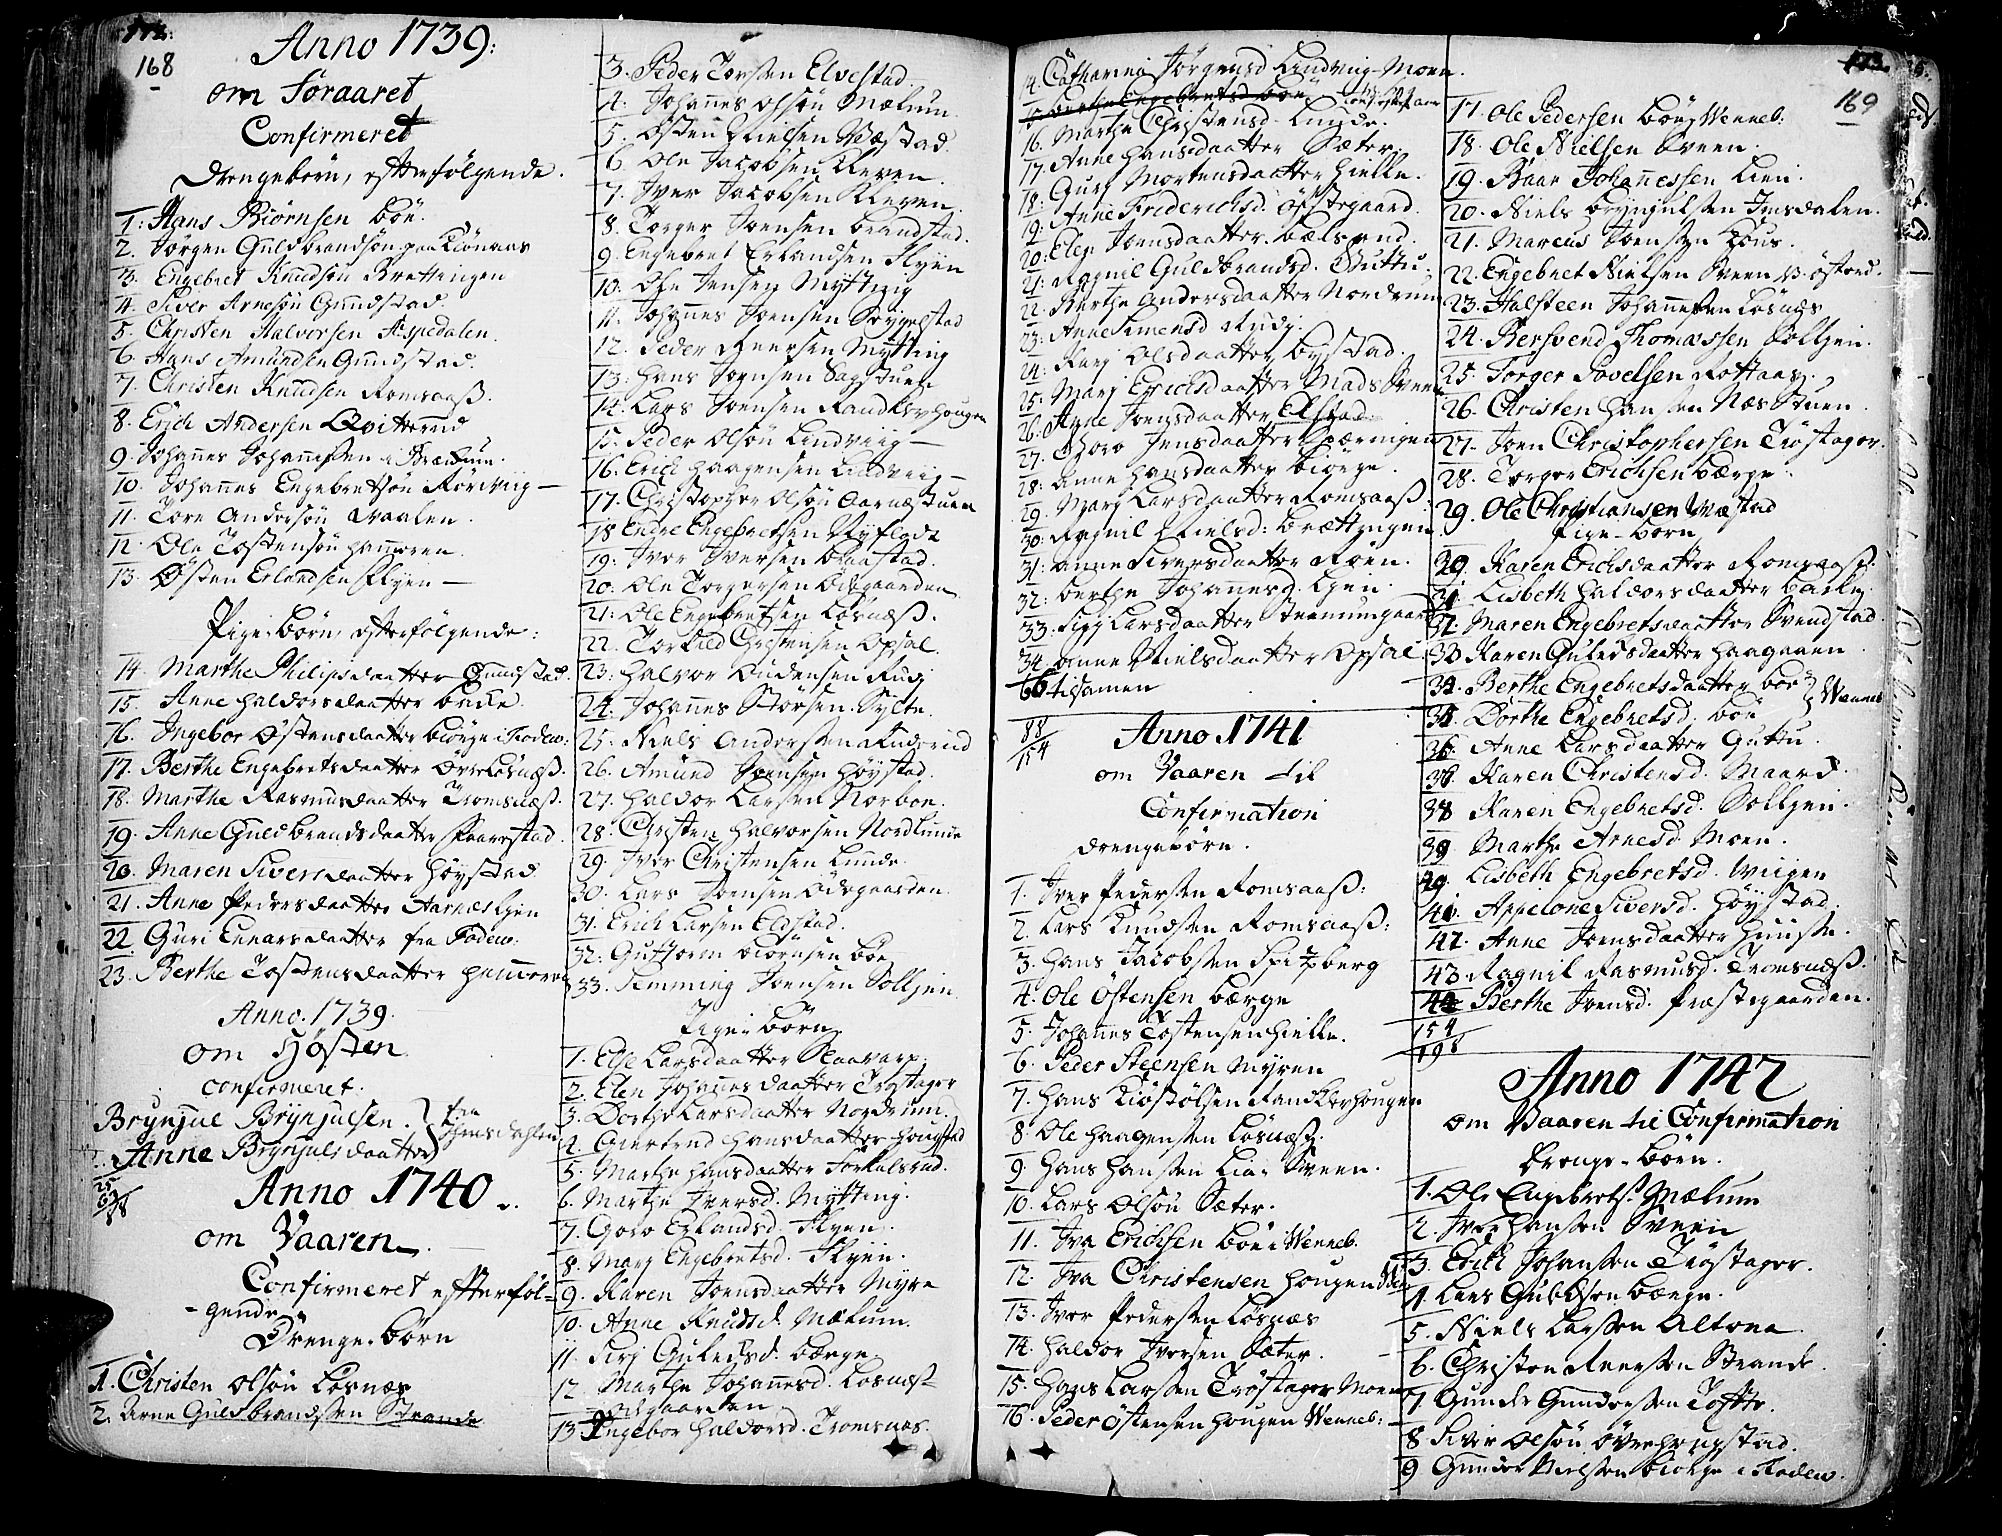 SAH, Ringebu prestekontor, Ministerialbok nr. 2, 1734-1780, s. 168-169